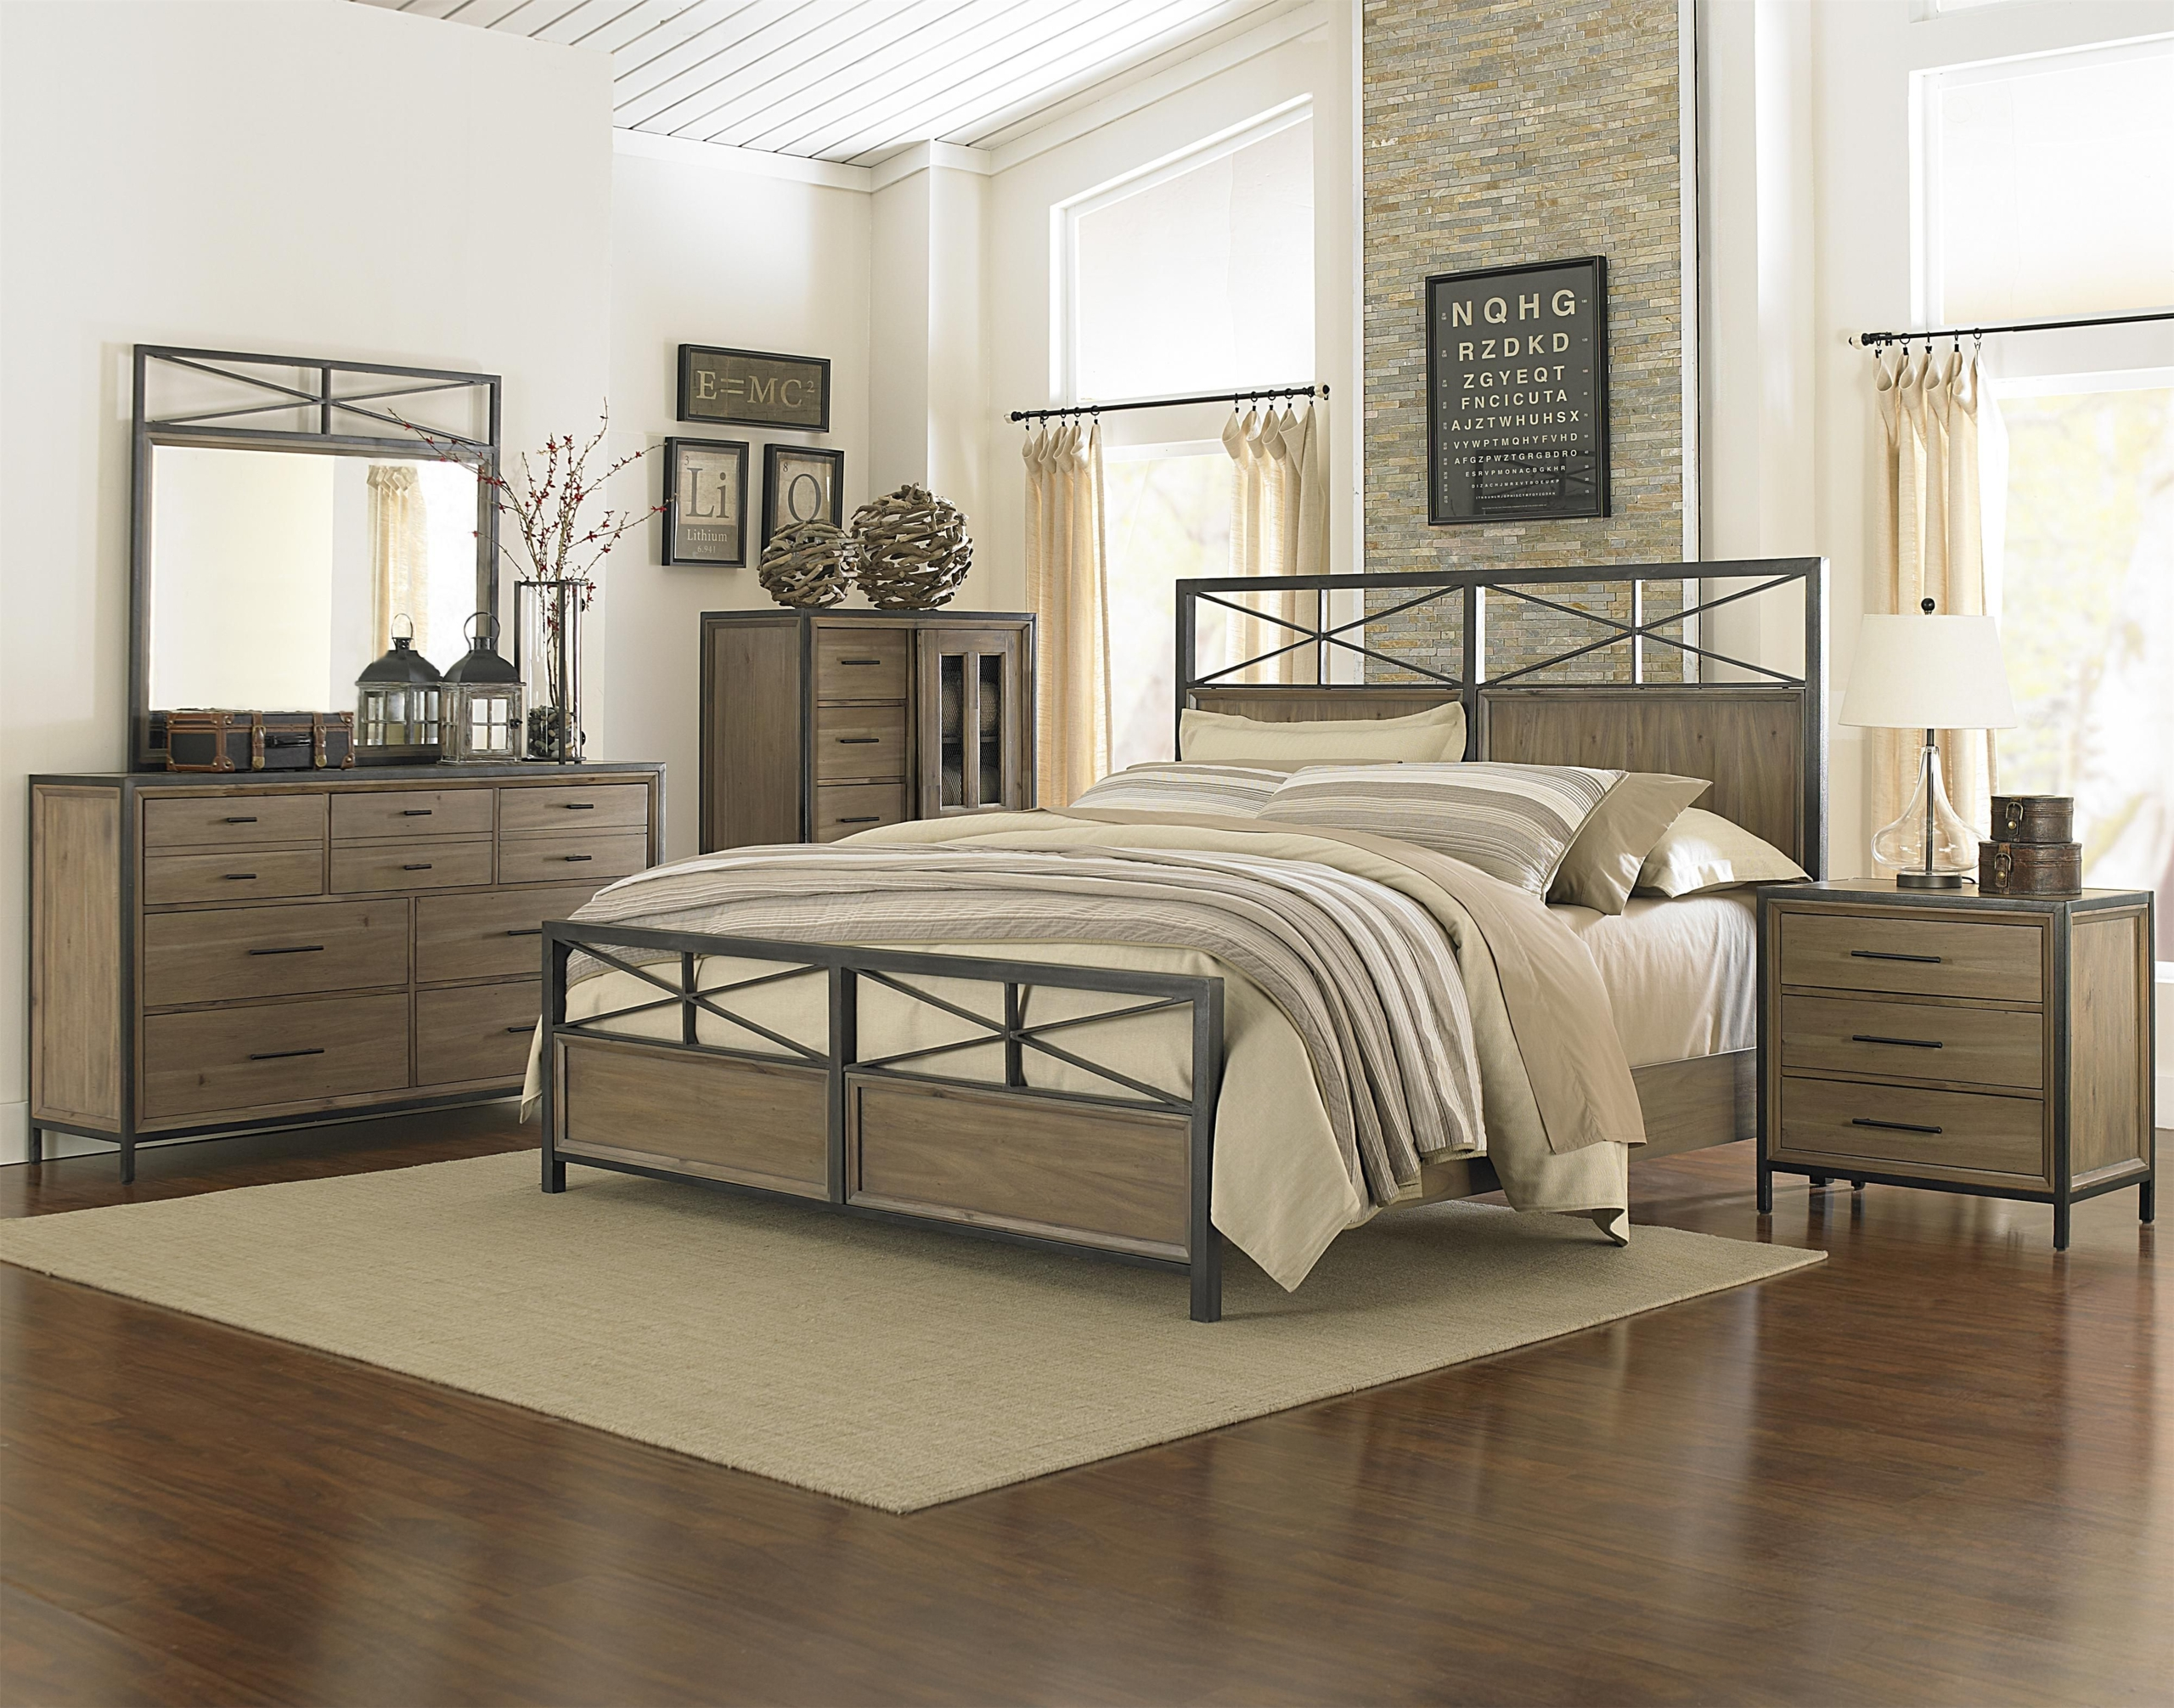 Charmant Metal And Wood Bedroom Sets 15